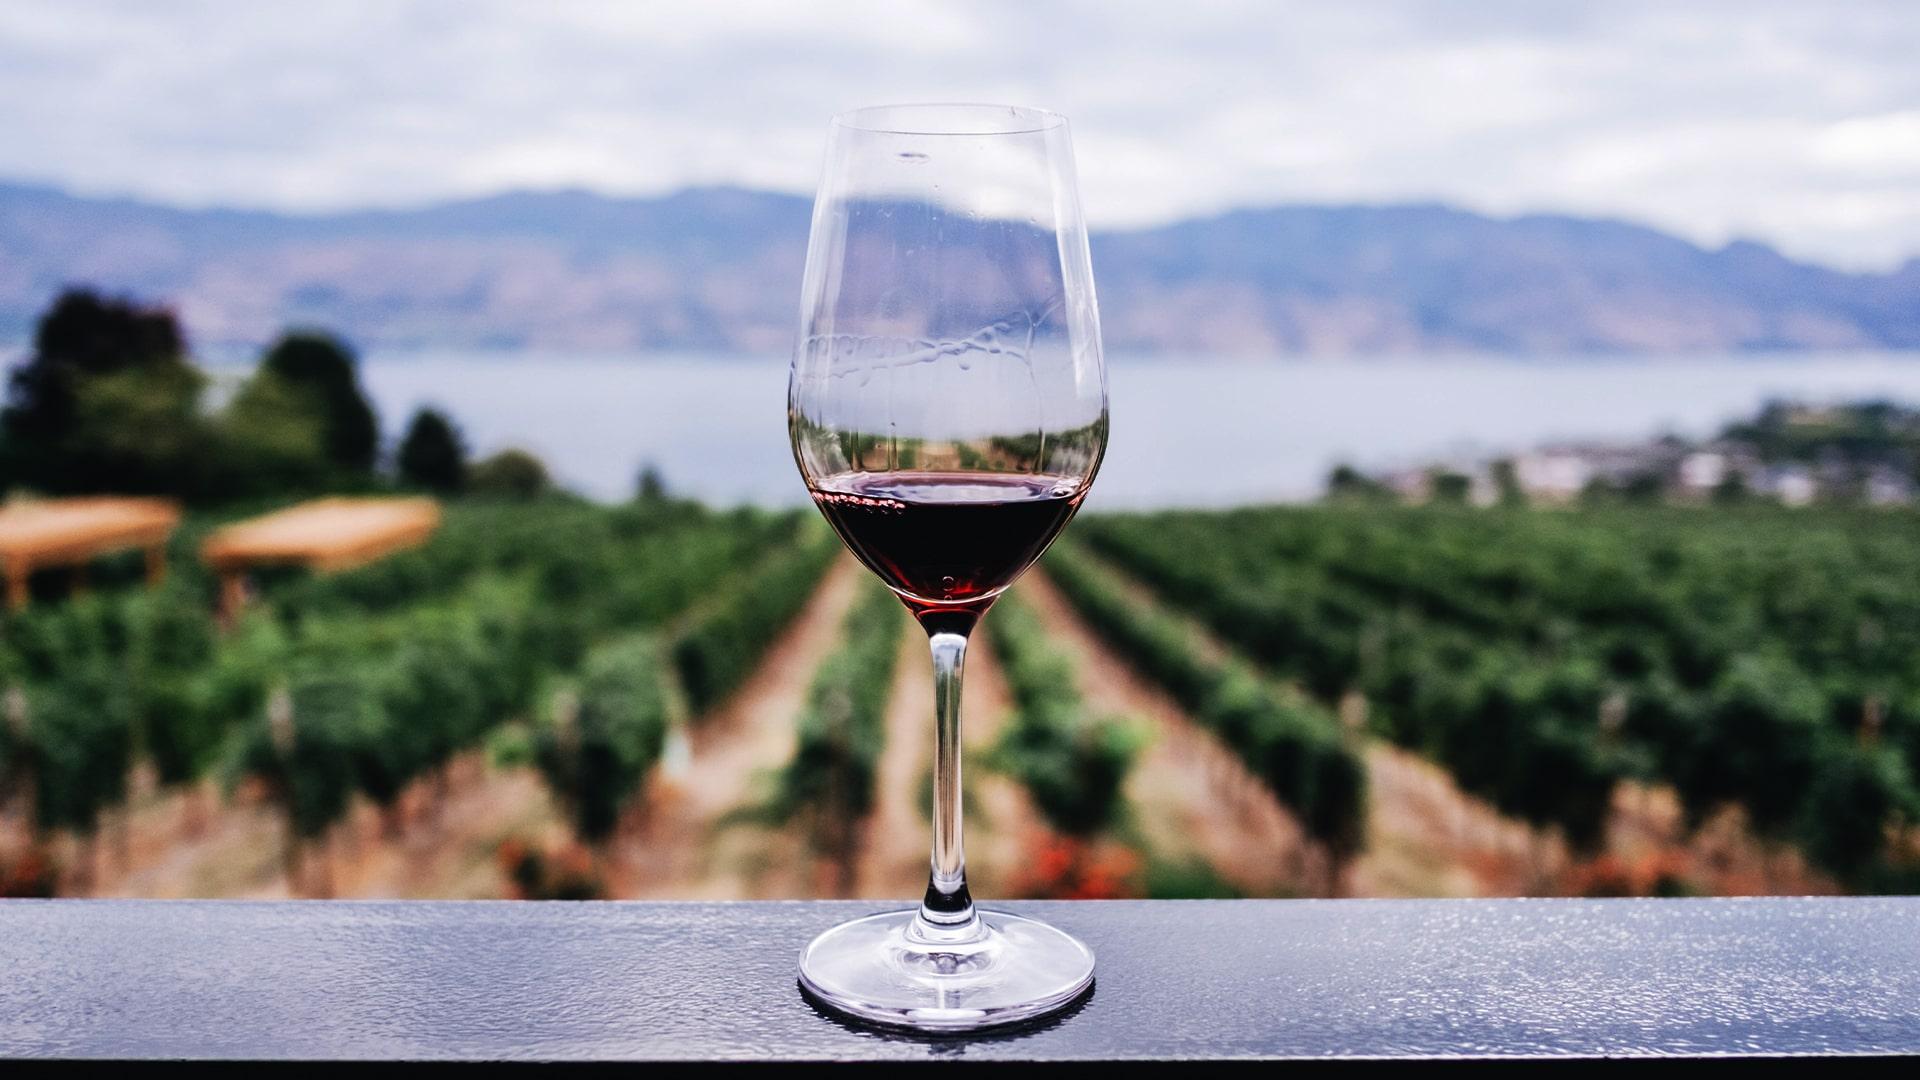 A digital taste of Pinot Noir